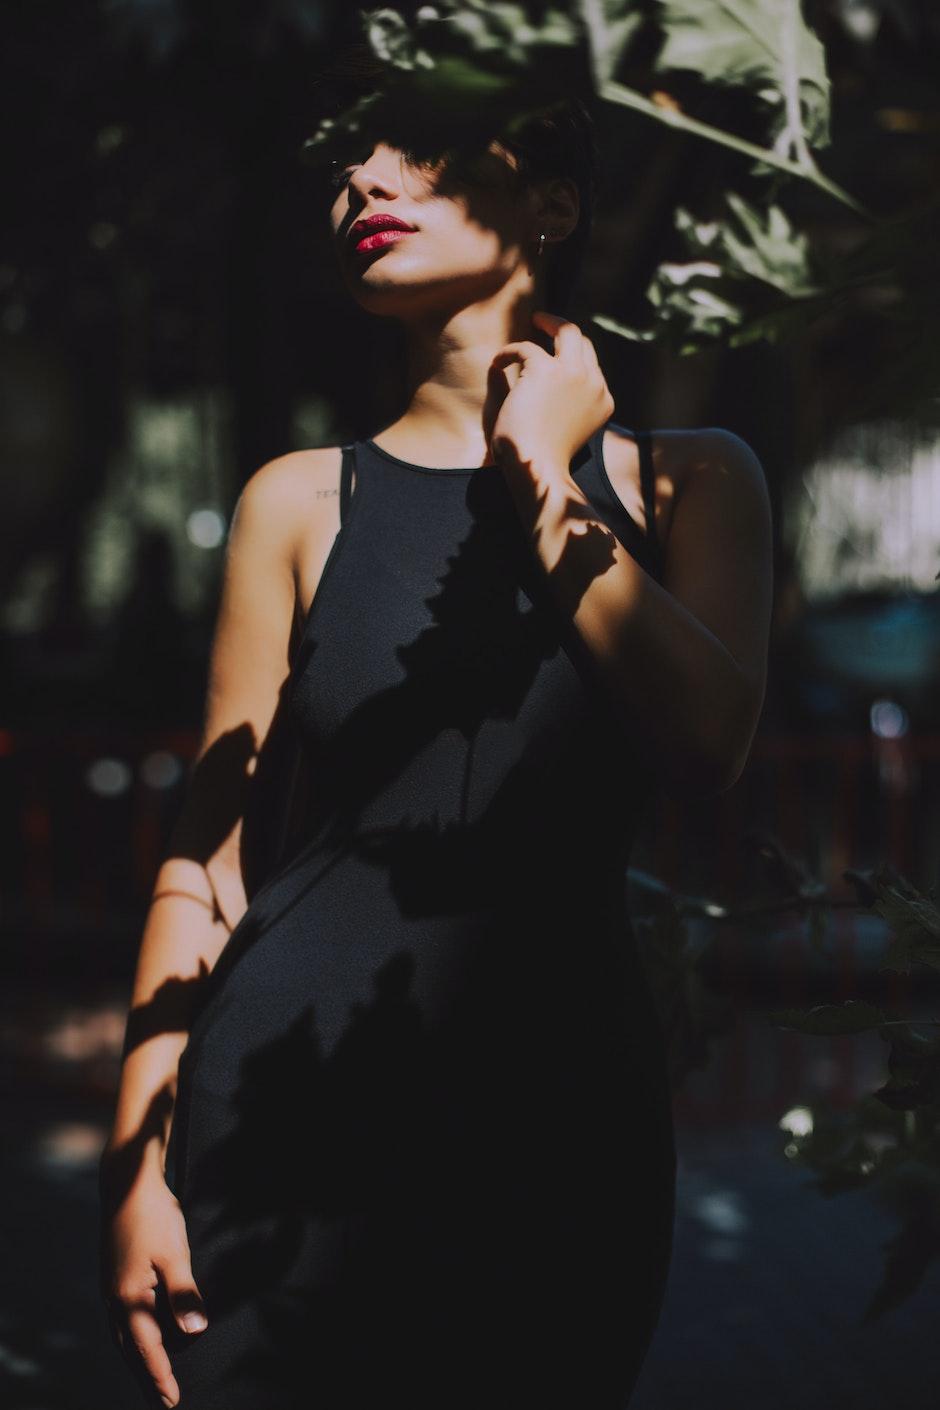 Woman Wearing Black Sleeveless Top Dress Under the Tree